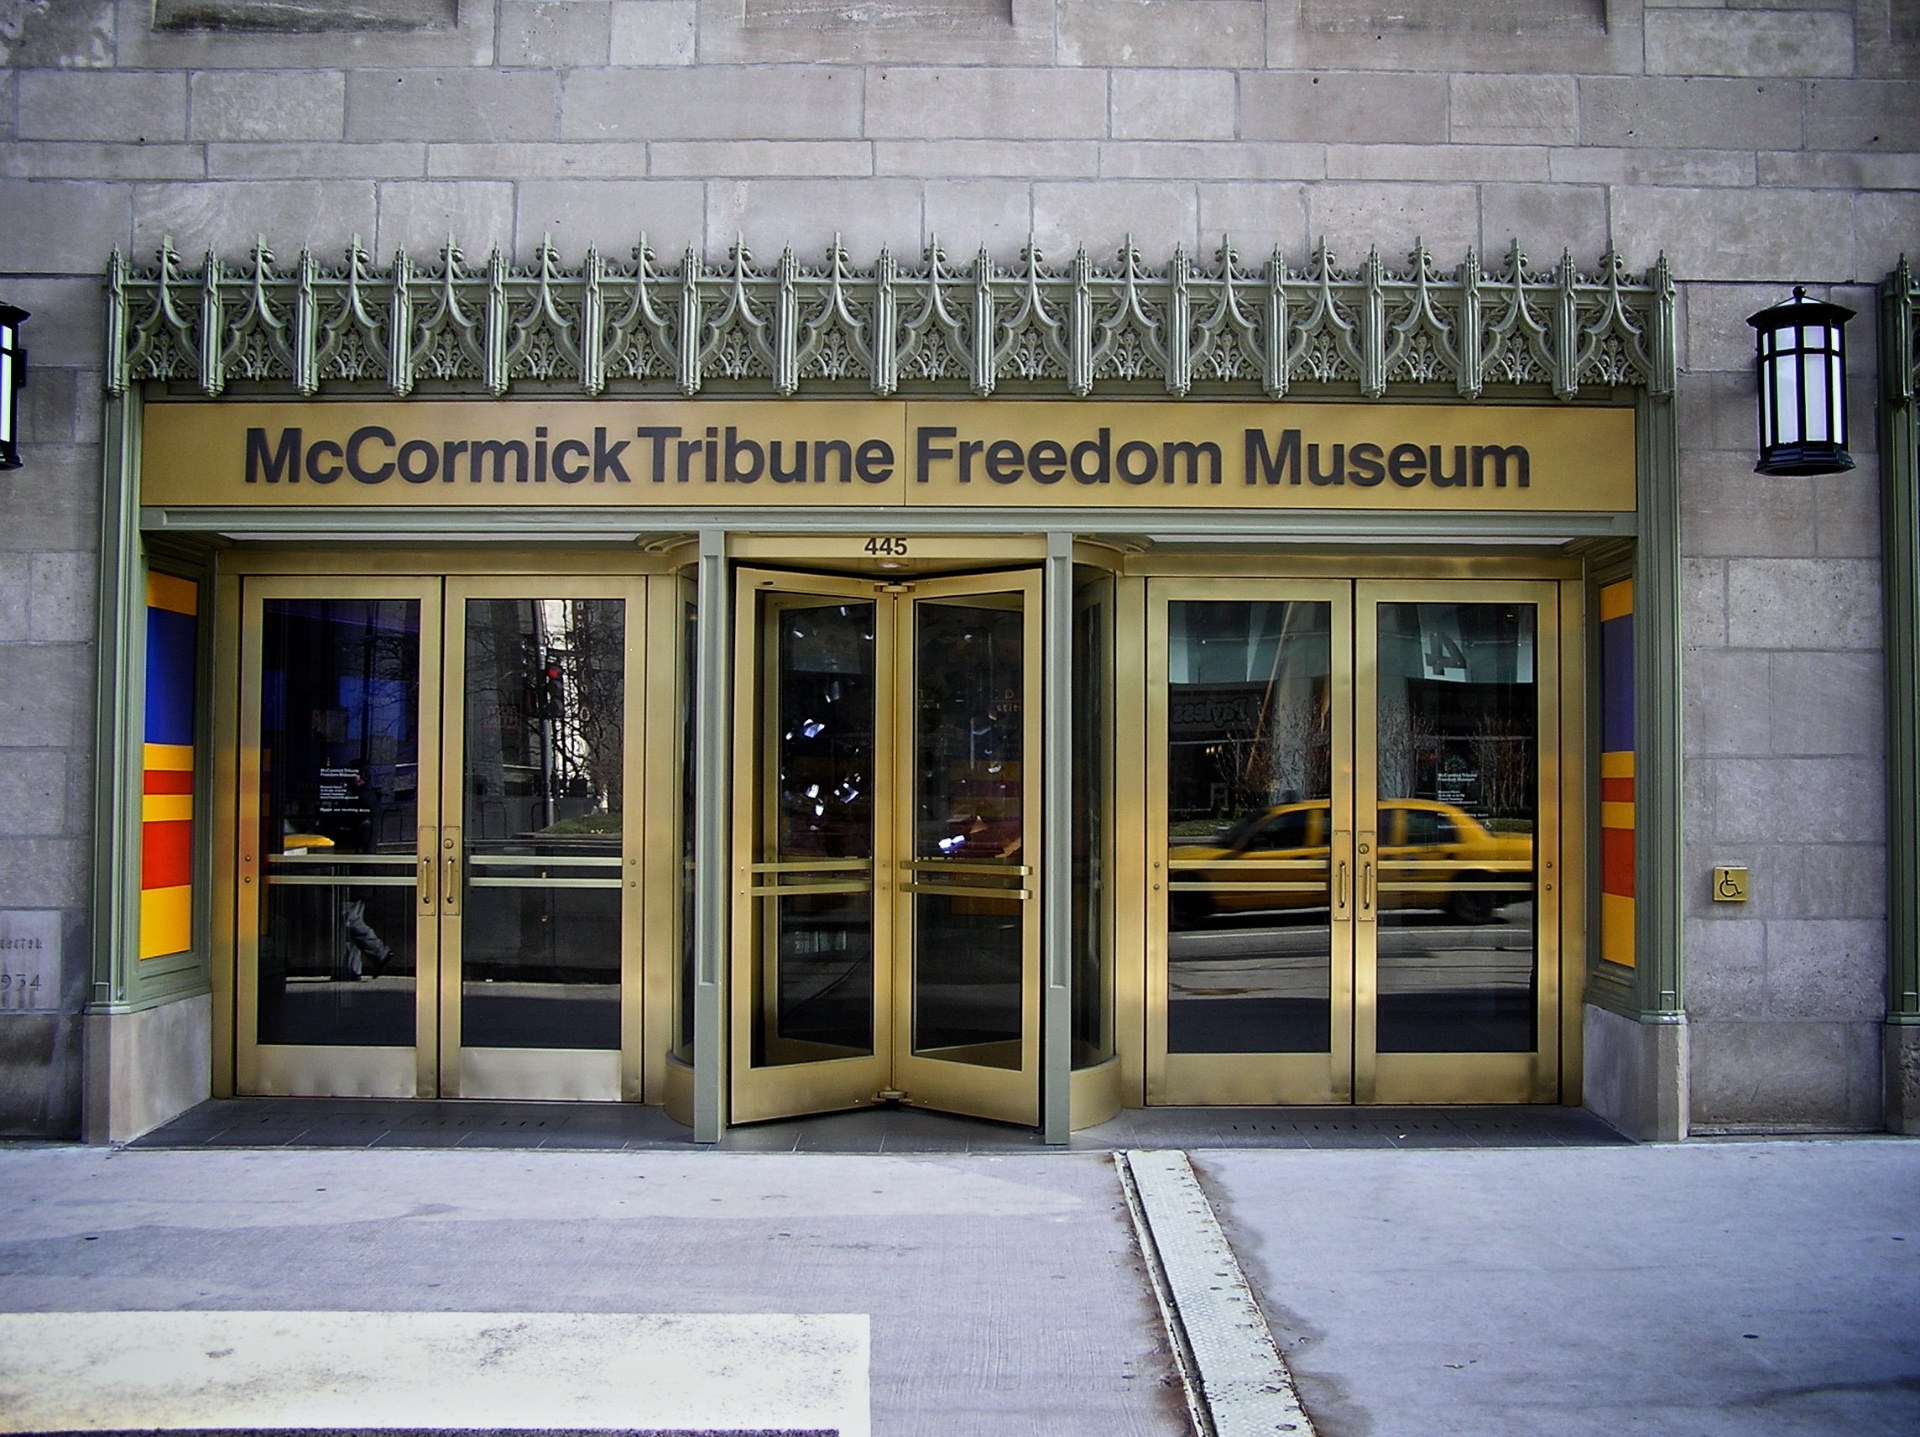 McCormick Tribune Foundation